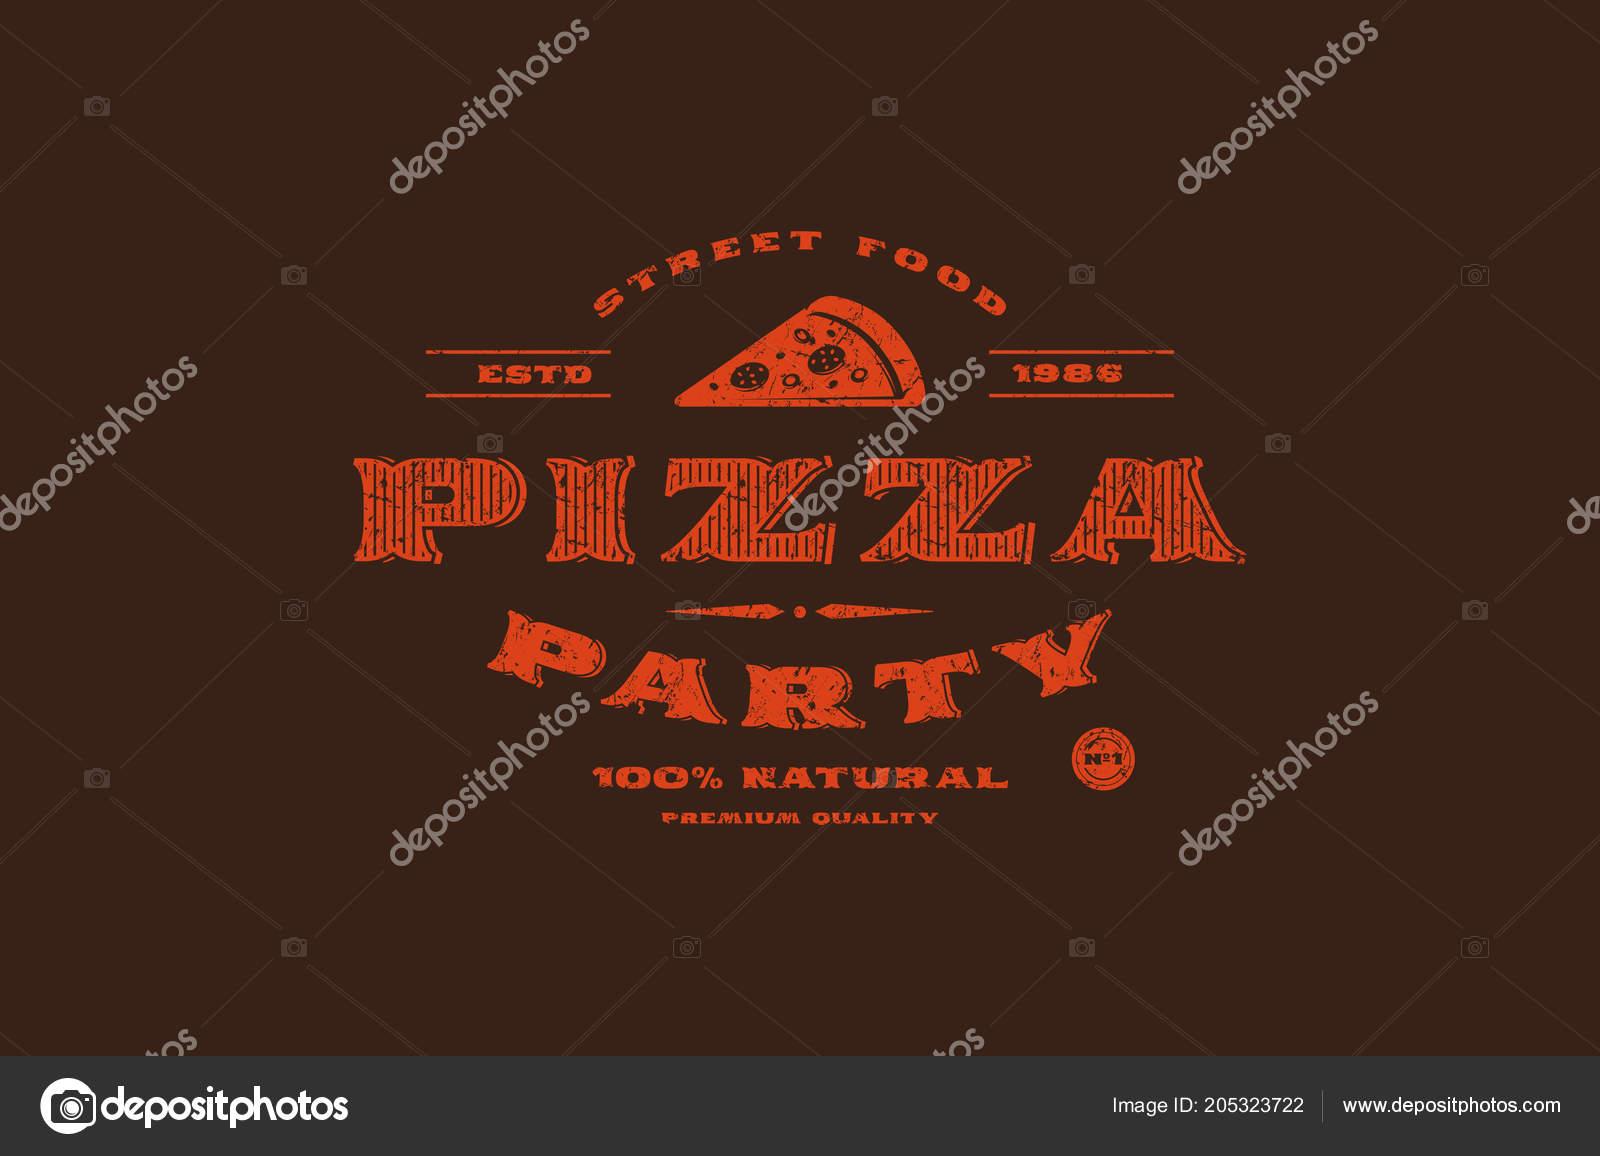 Plantilla Vector Stock Etiqueta Pizzería Diseño Con Textura Rugosa ...